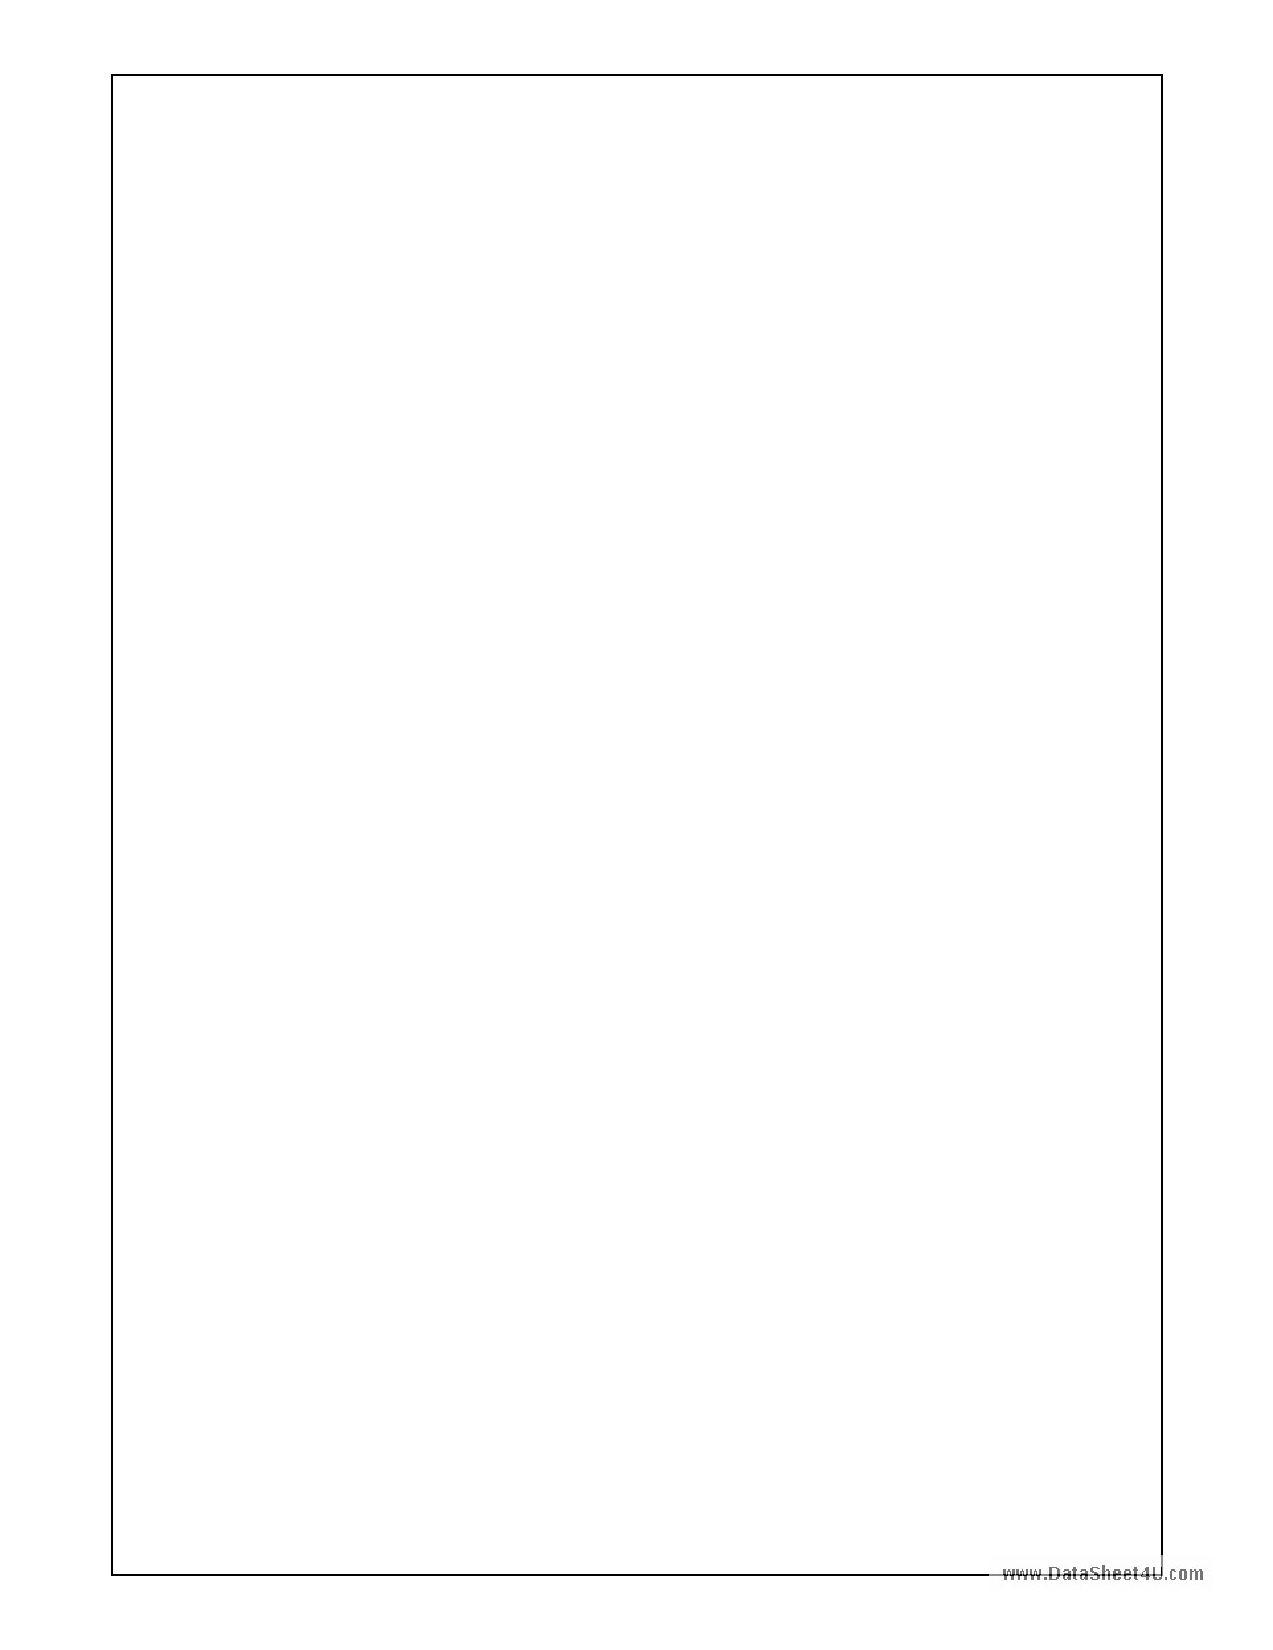 G1-200P-85-1.6 pdf